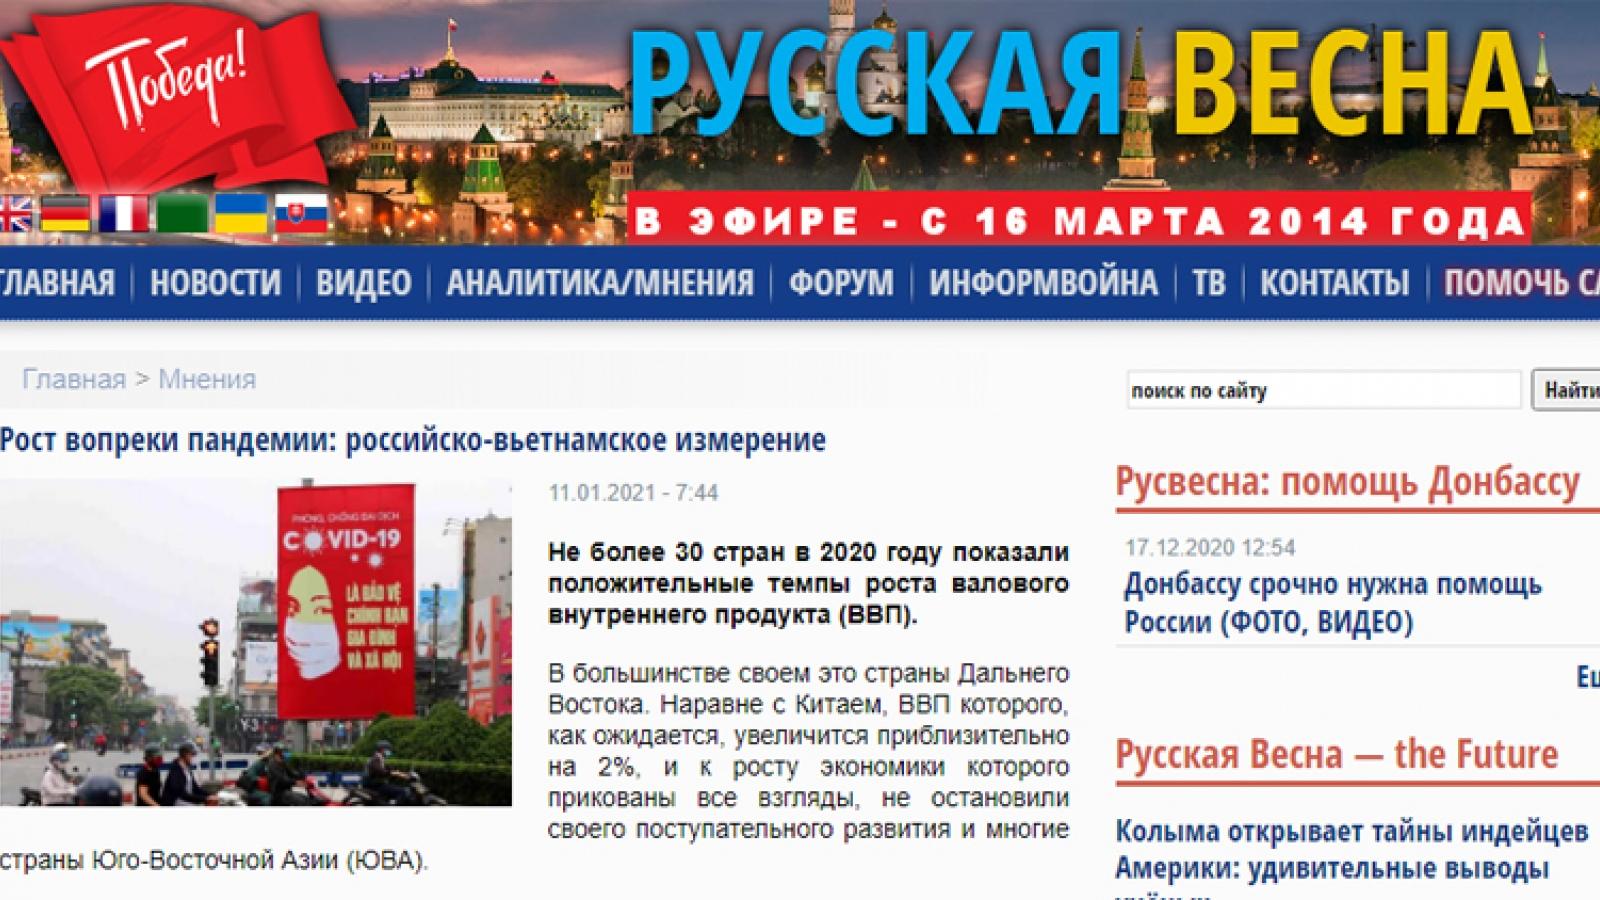 Russian paper highlights impressive Vietnamese economic growth